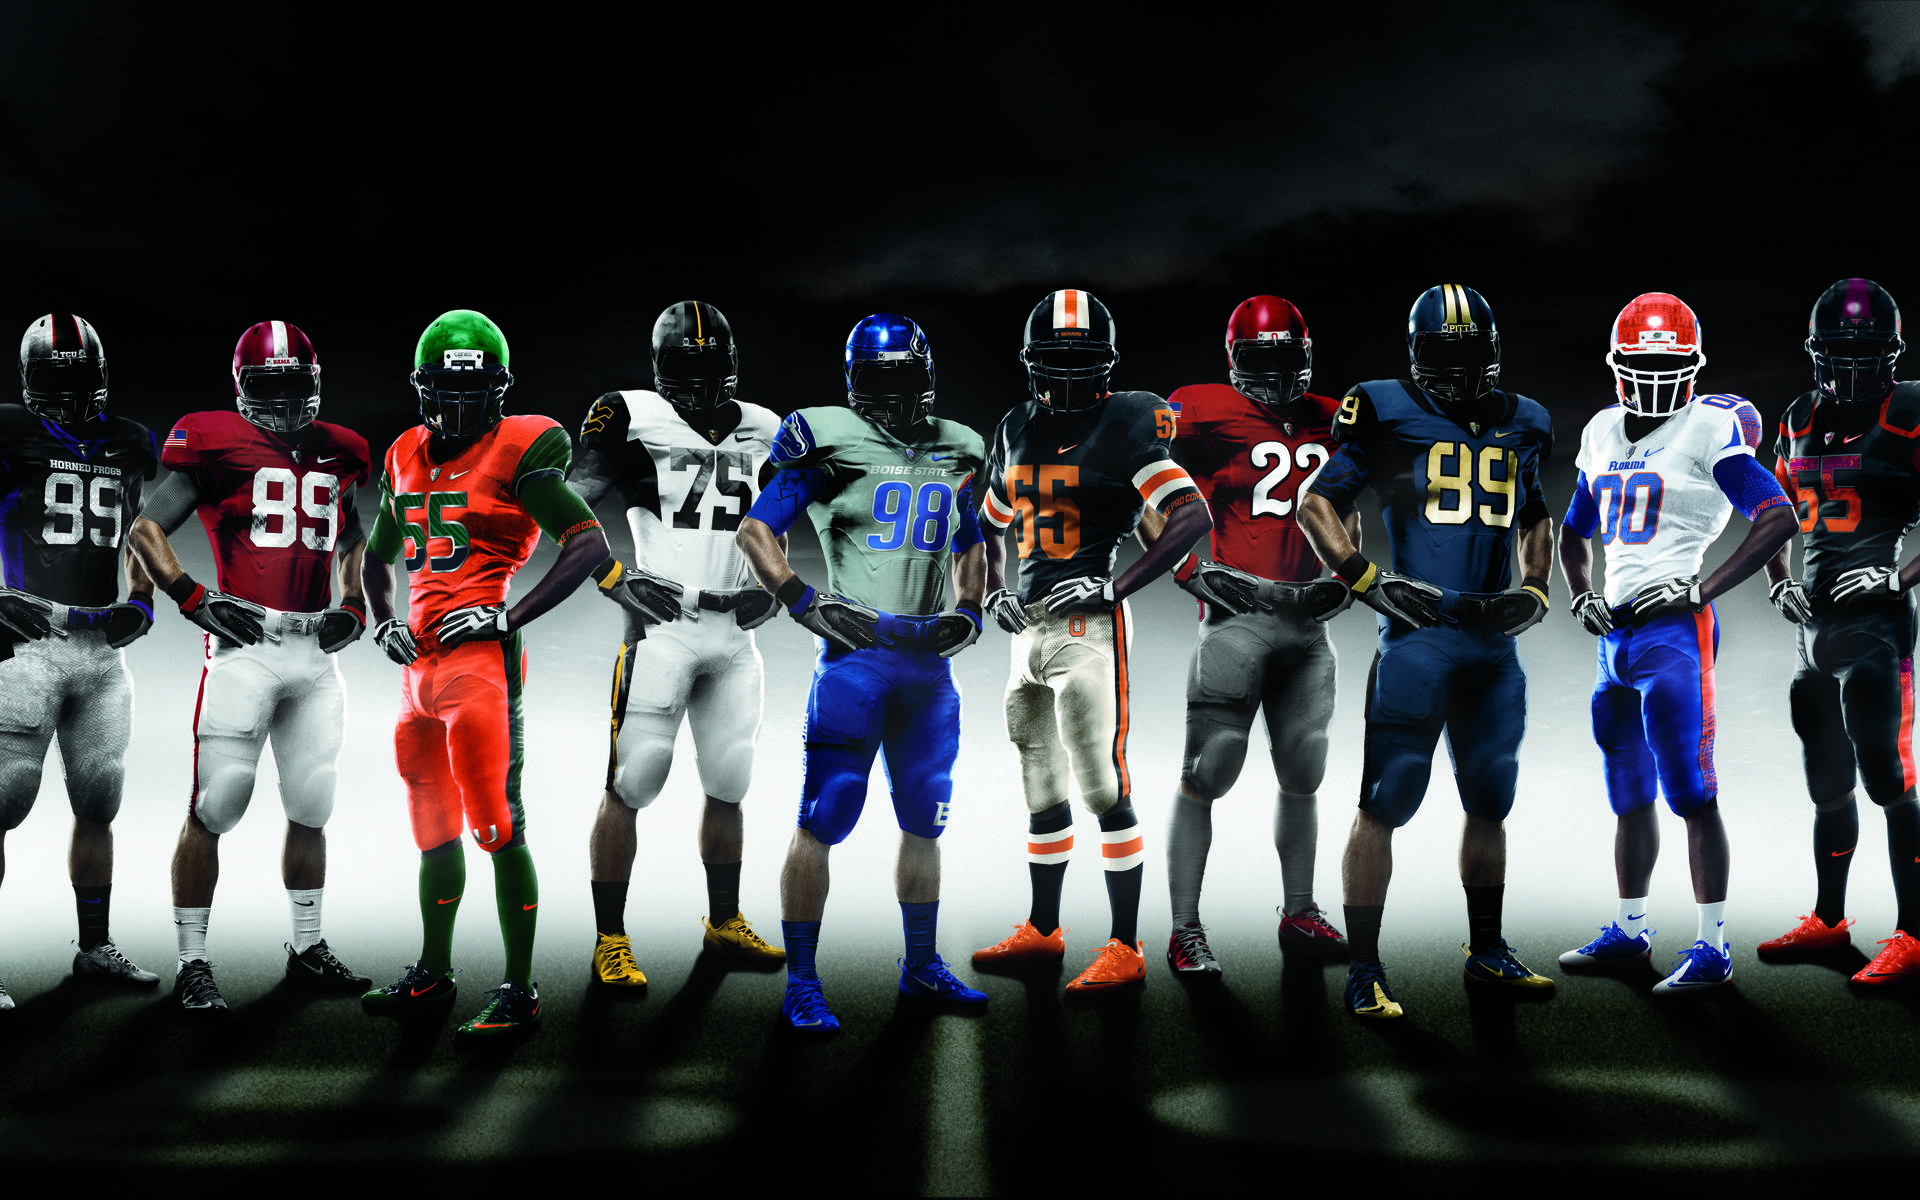 Nike Football Wallpapers - Wallpaper Cave - photo#44